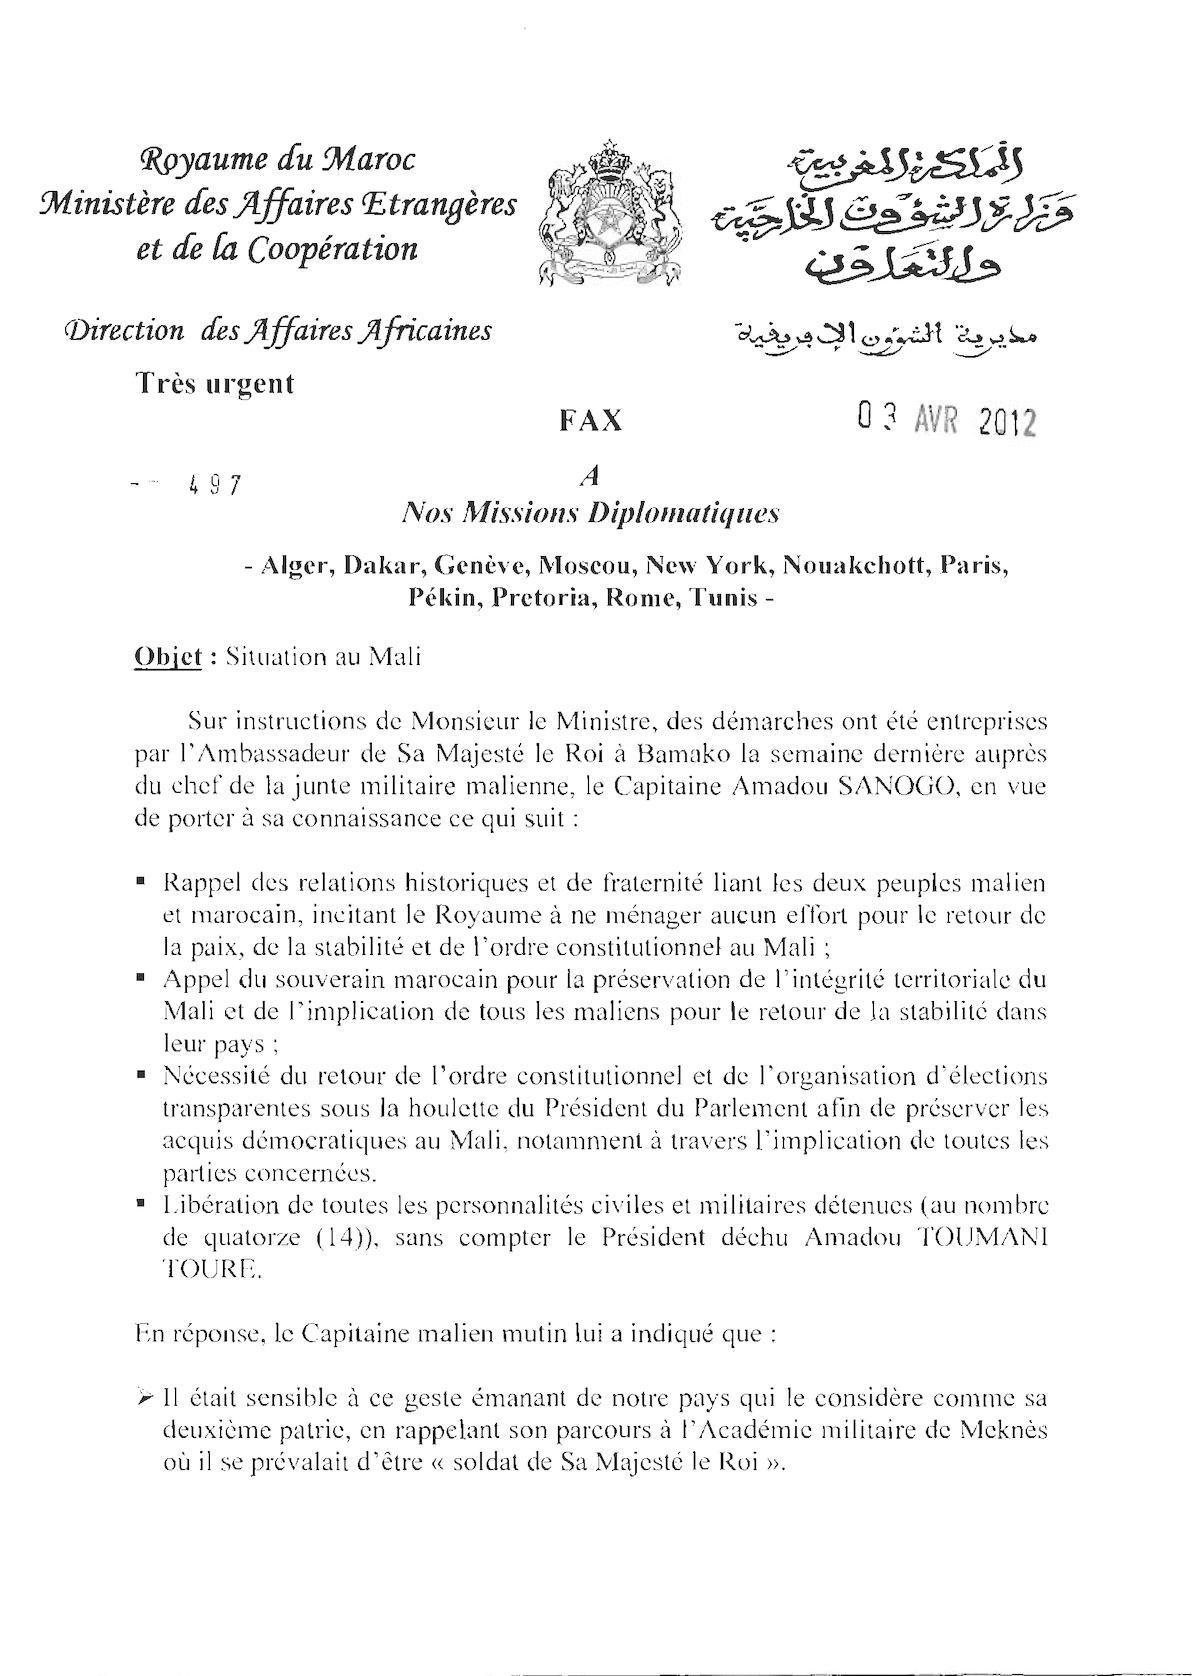 03 04 12, Missions Diplomatiques, Situatio Mali